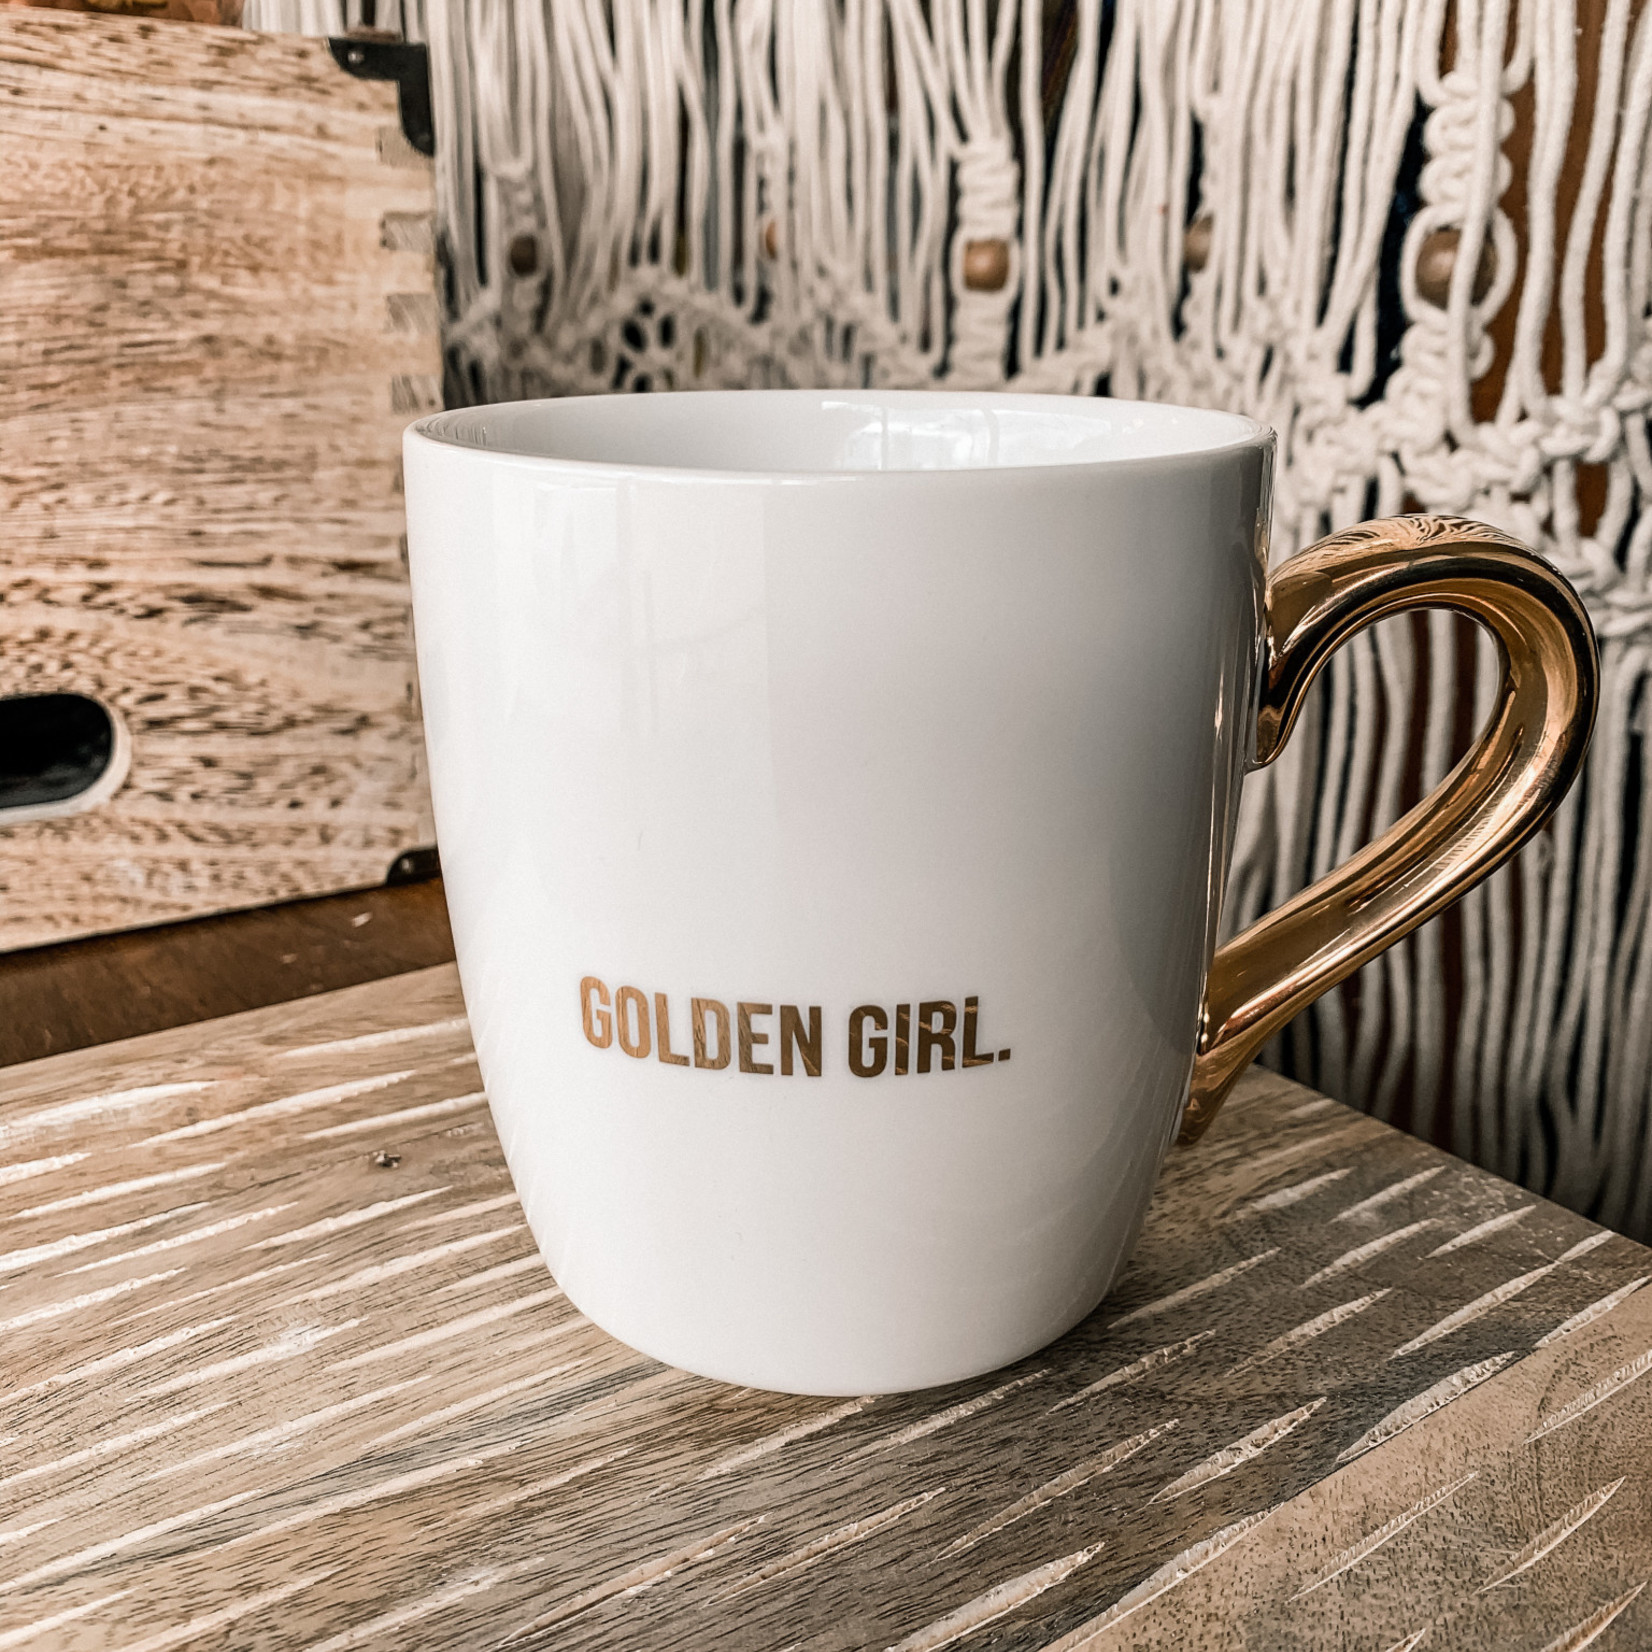 Santa Barbara Designs Gold Mug - Golden Girl